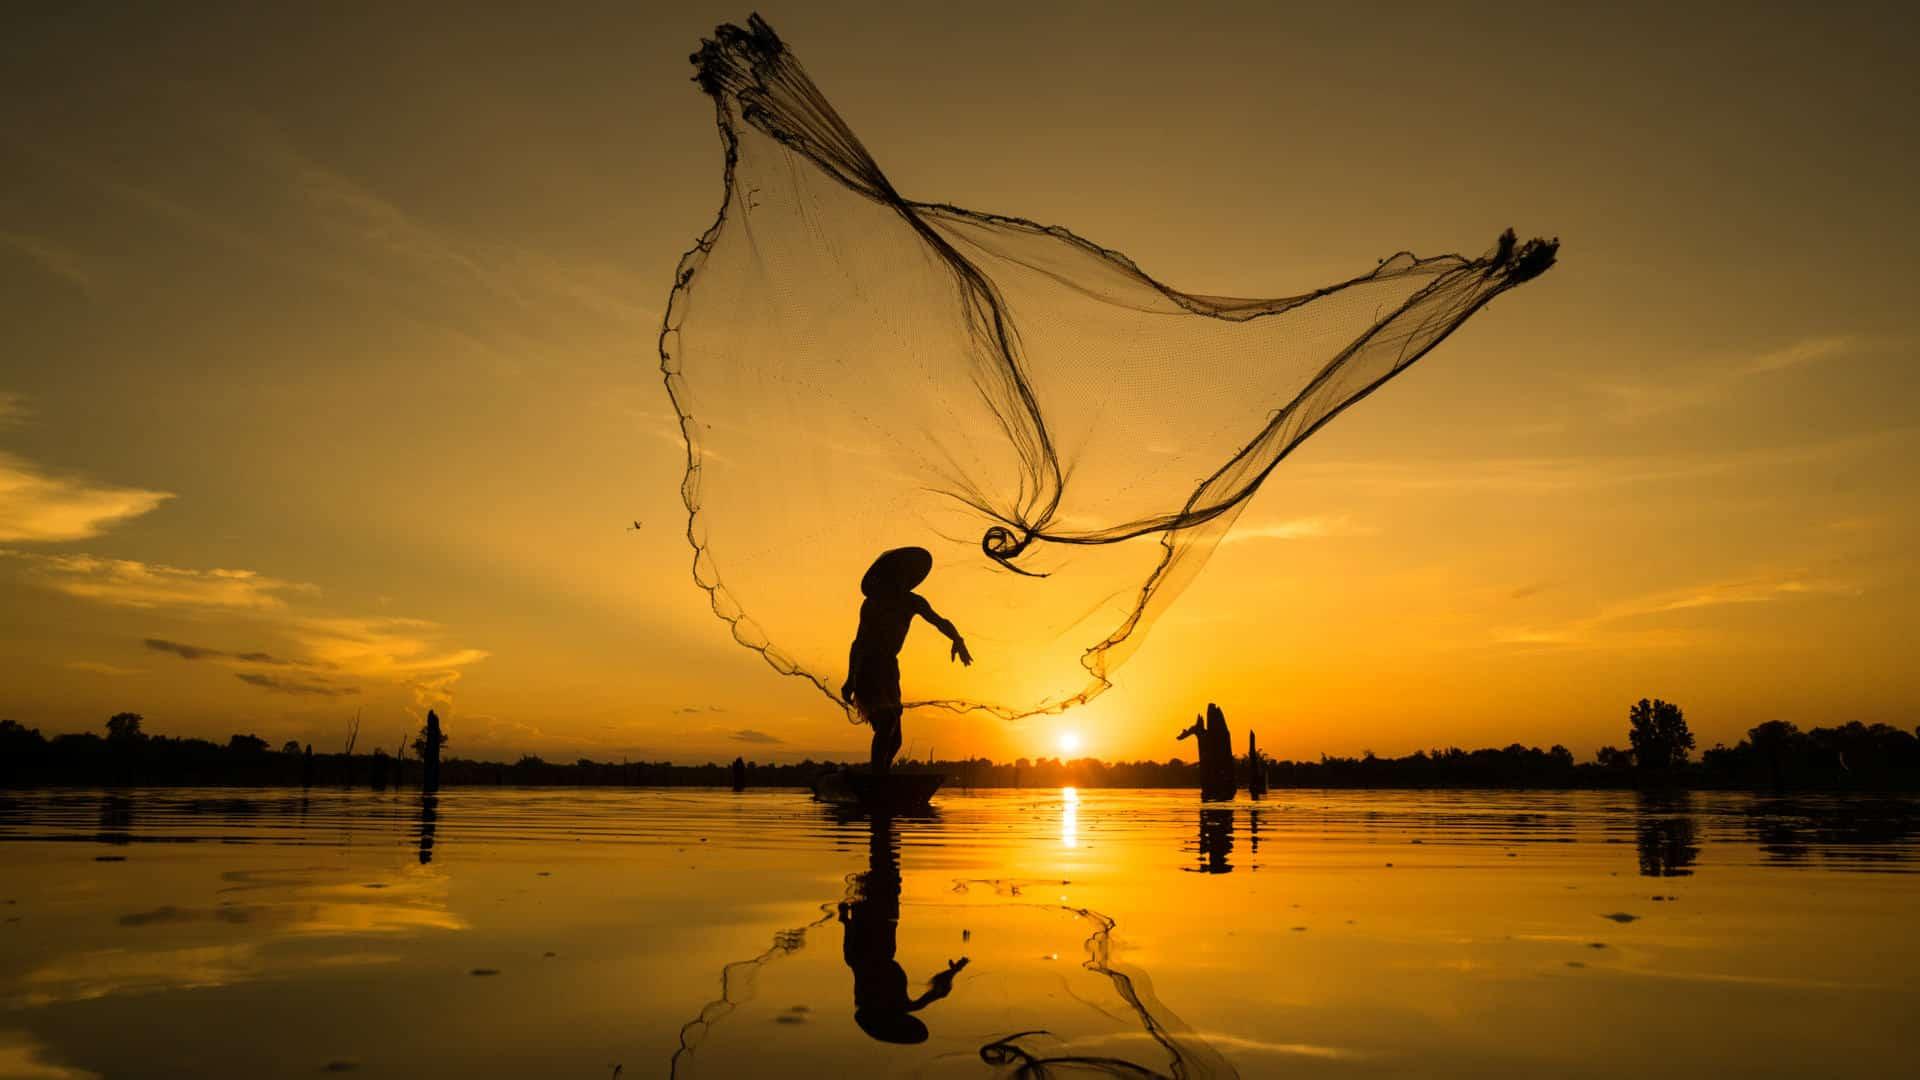 Vietnam_fishermen_with_net